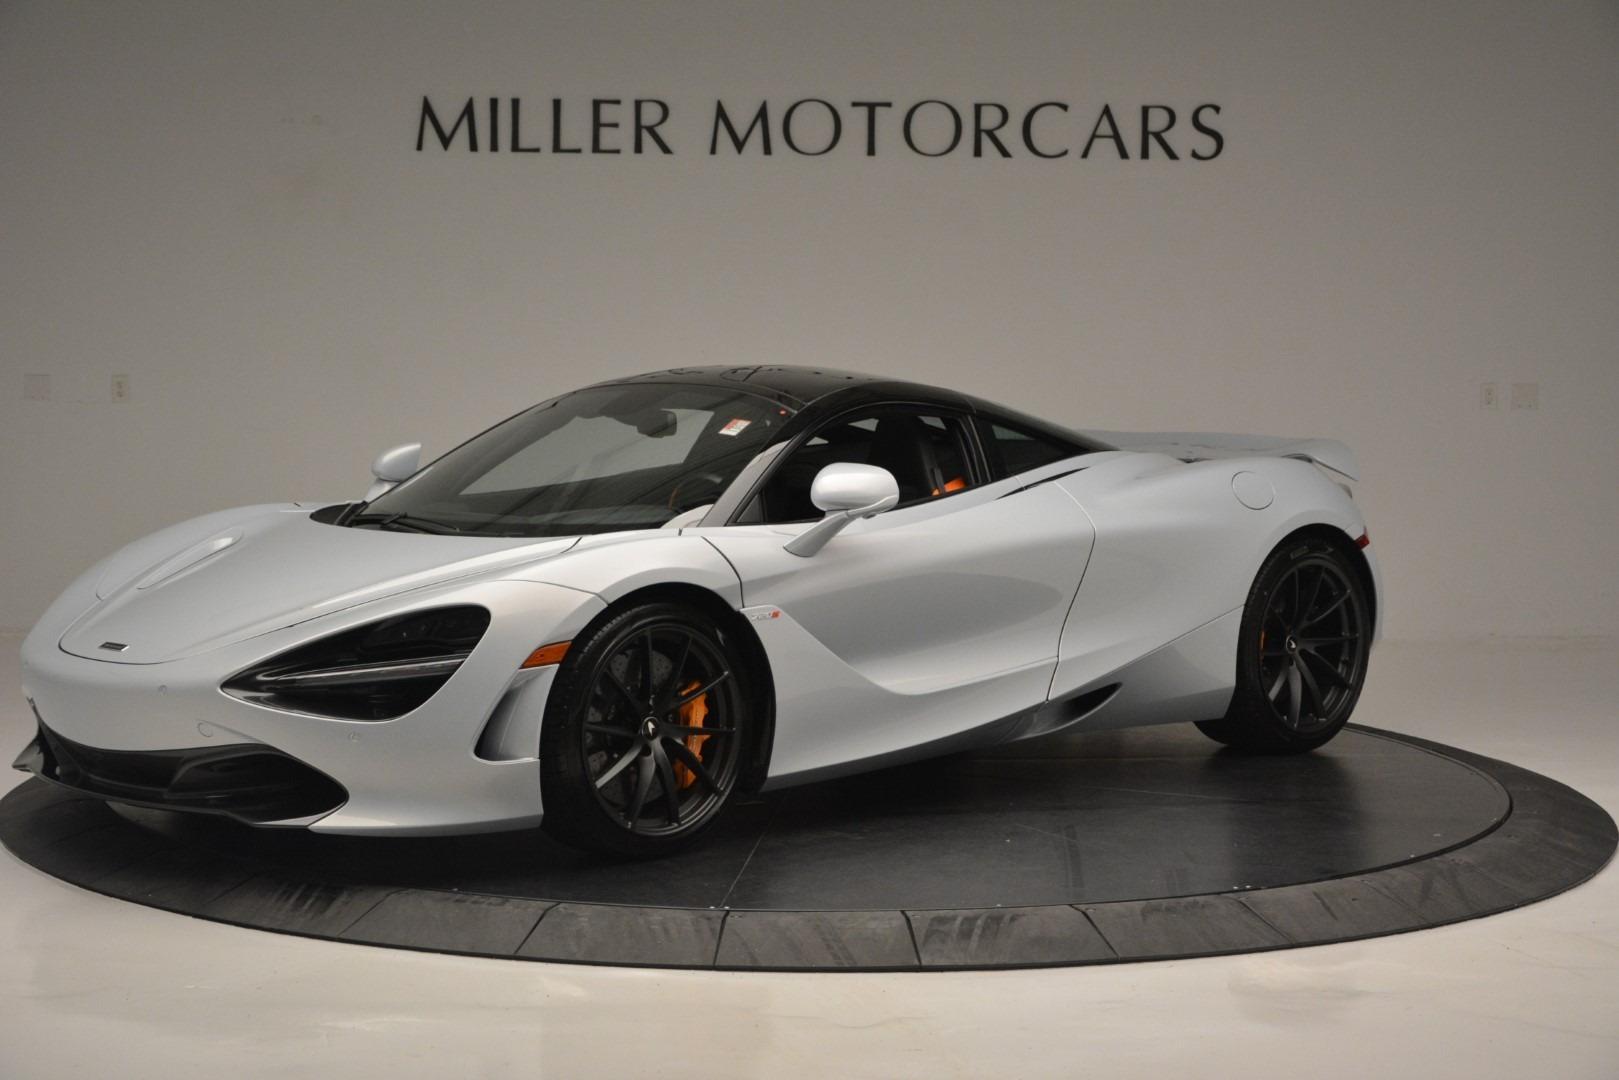 New 2019 McLaren 720S Coupe for sale $344,340 at Maserati of Westport in Westport CT 06880 1